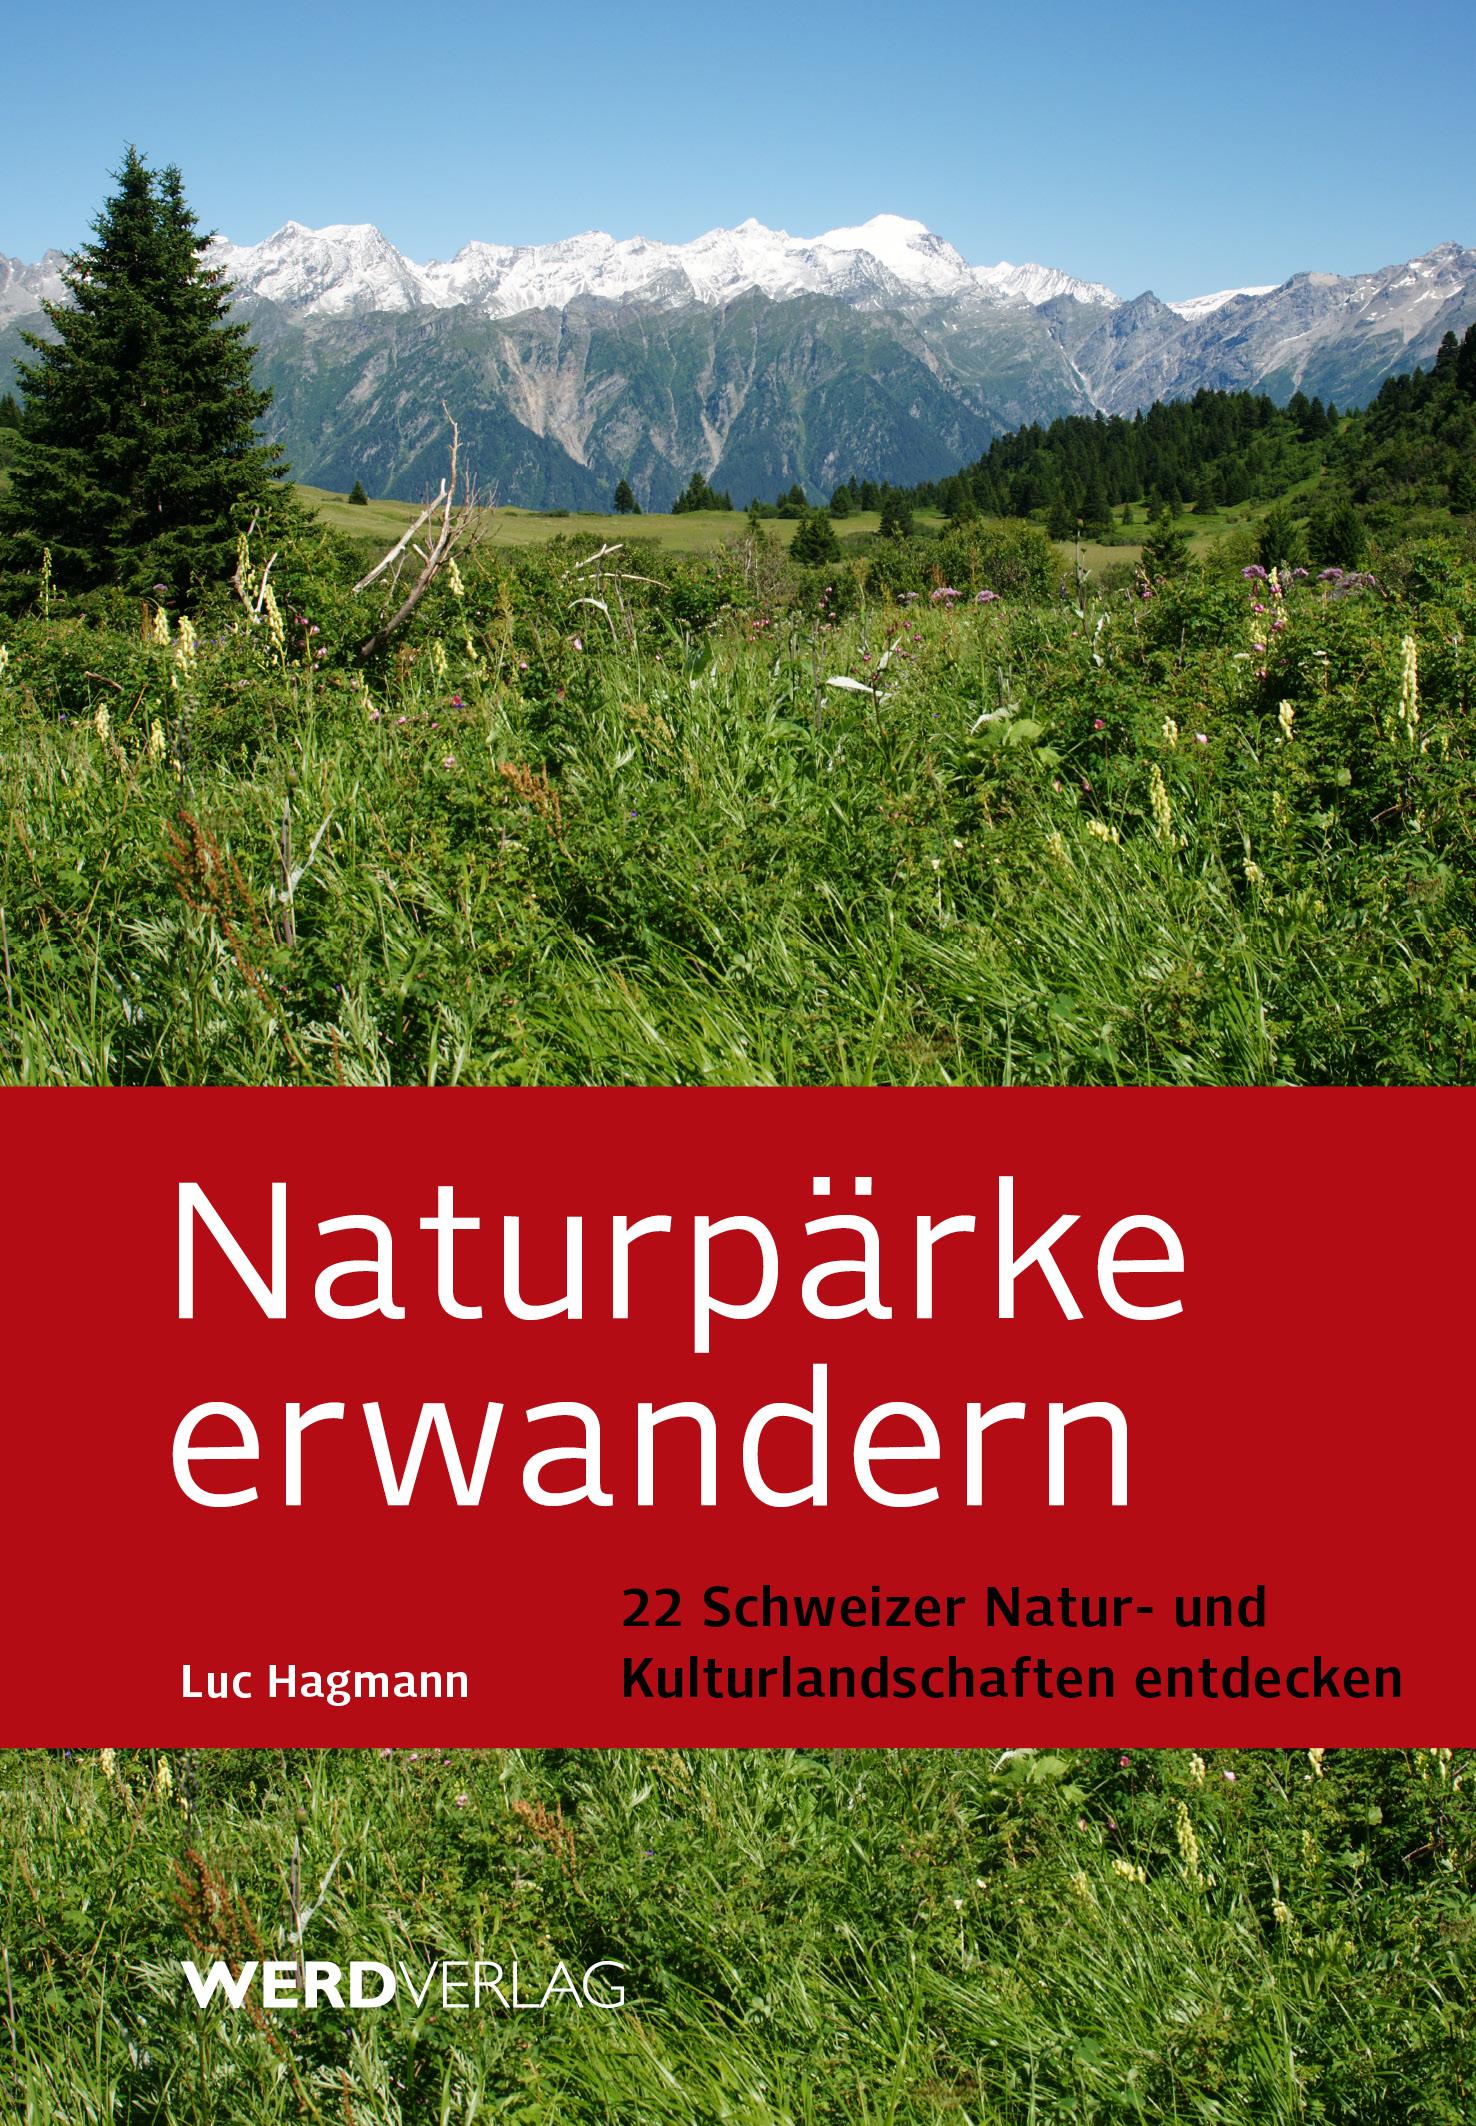 Naturpaerke-erwandern-Luc-Hagmann